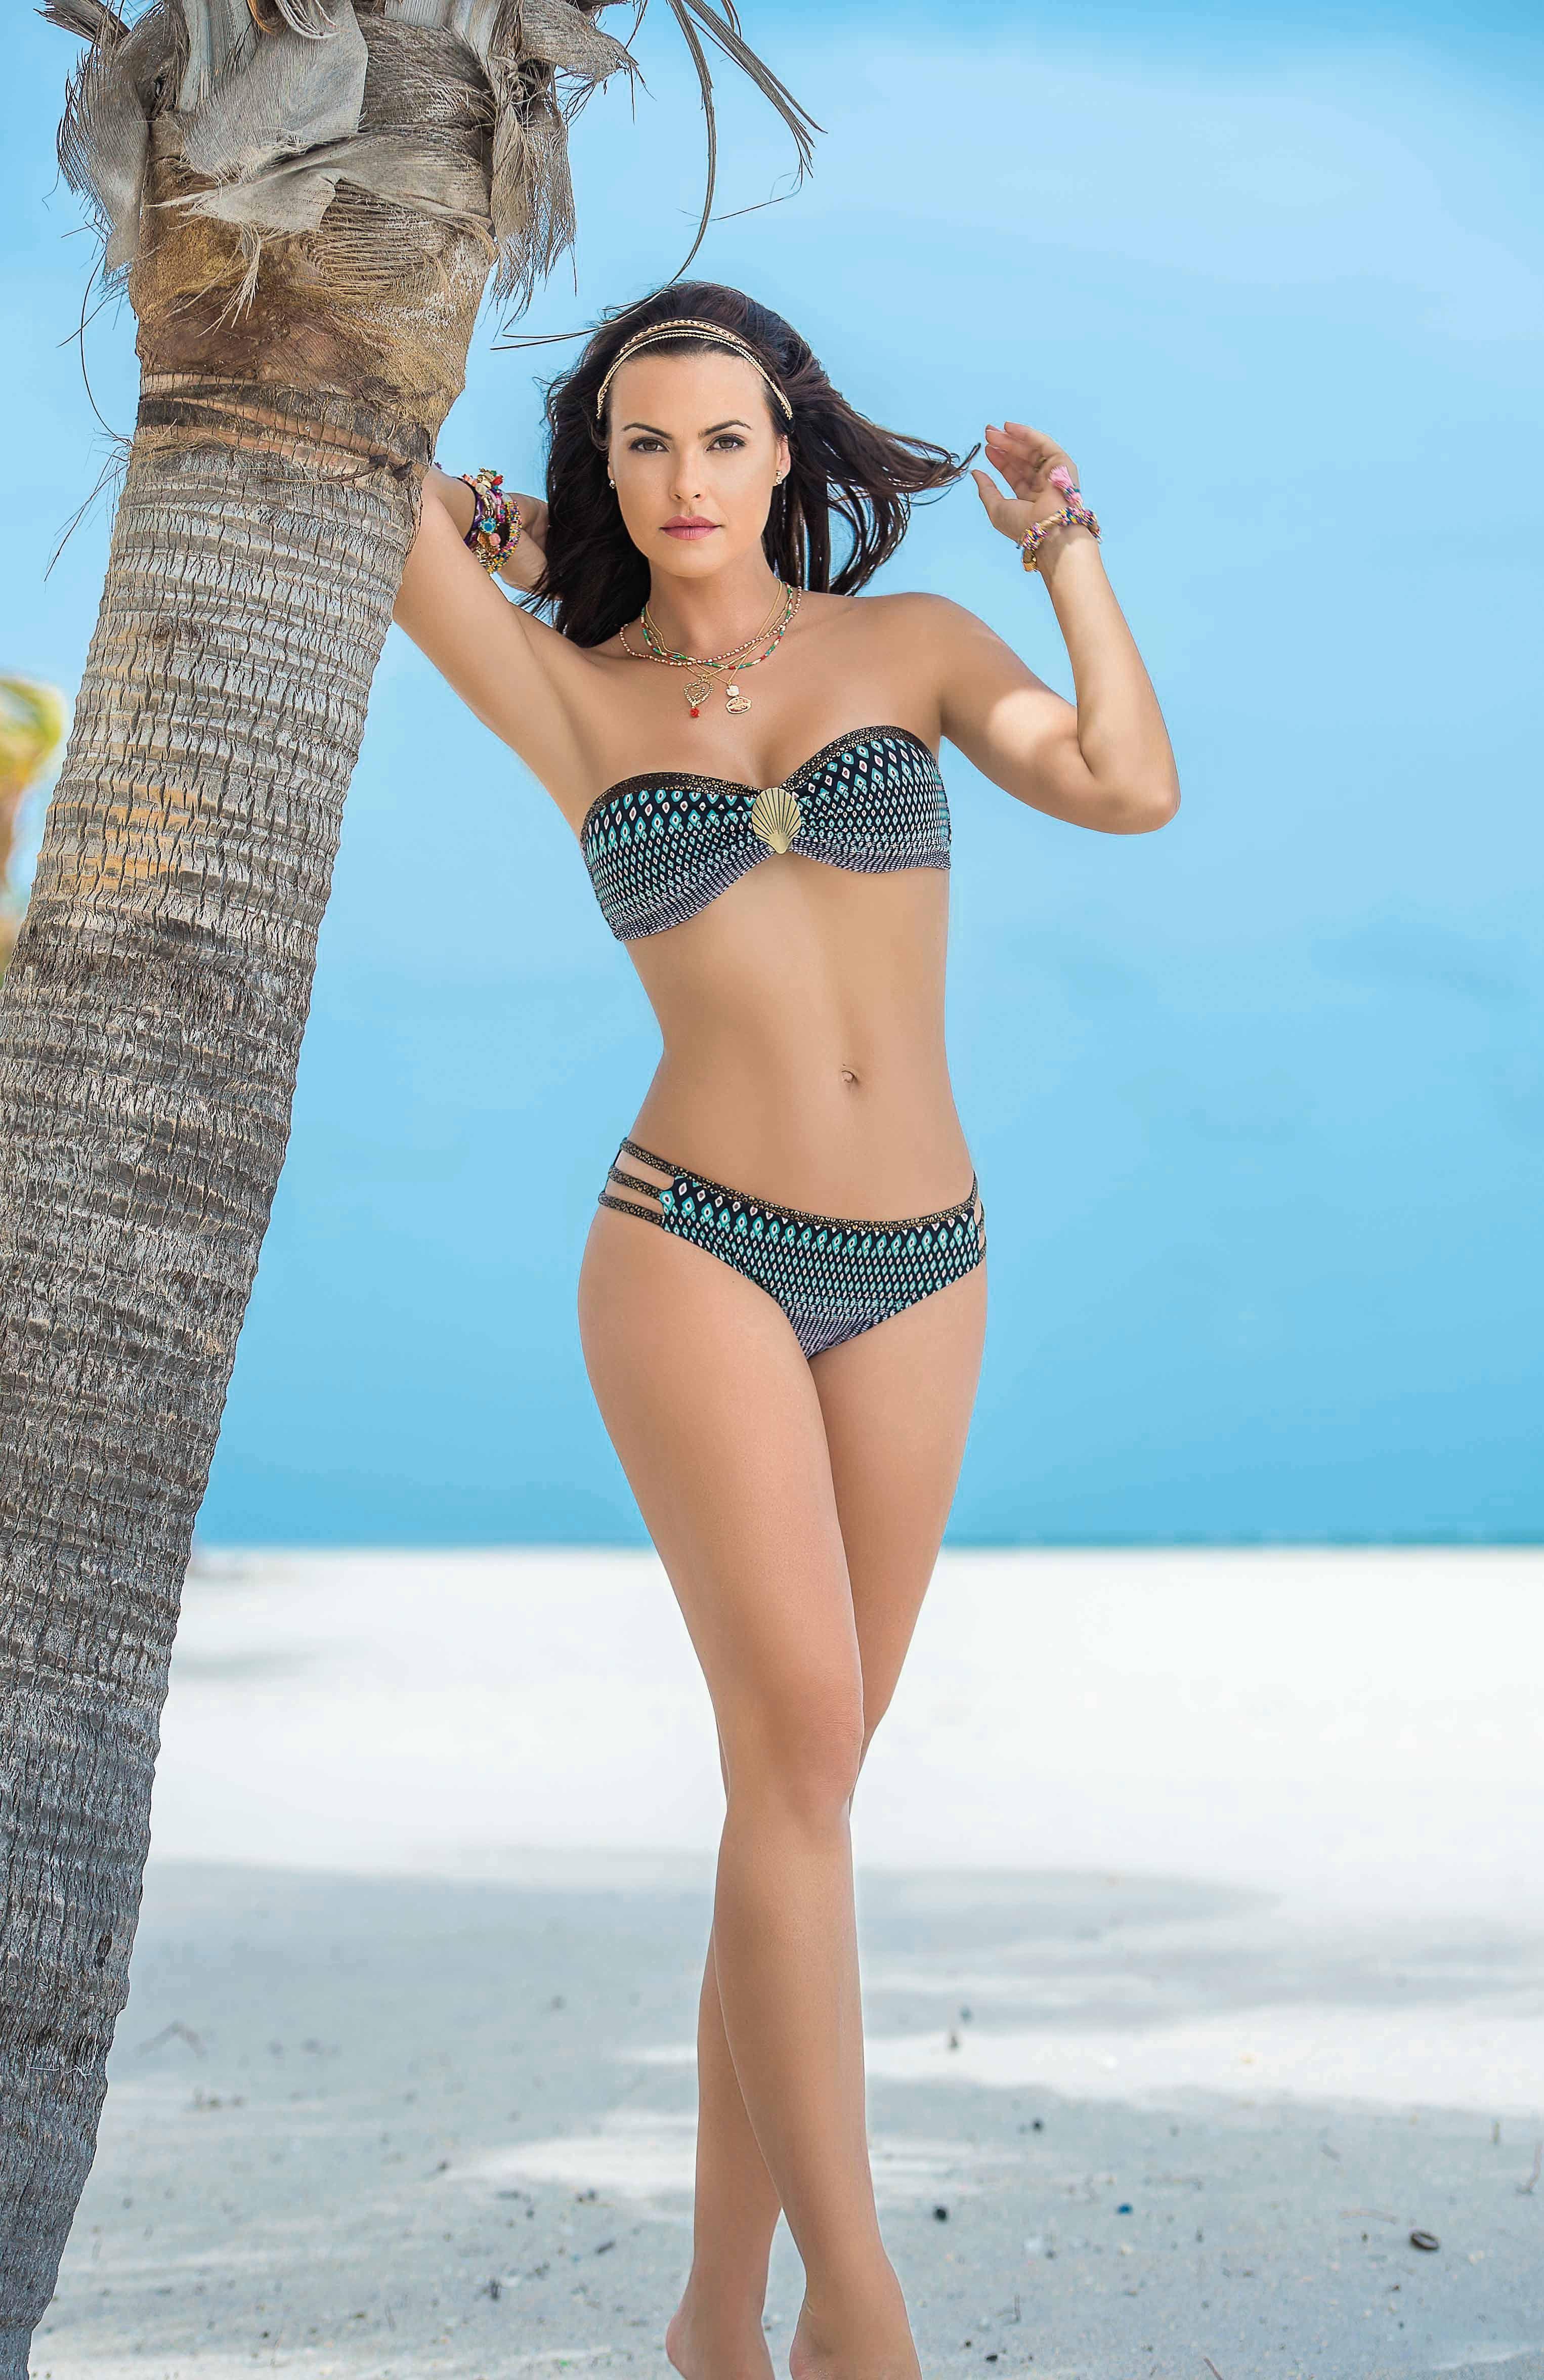 40bd39590466 Garotas Vestido de Baño - Strapless Ref 3053 #swimwear #beach ...